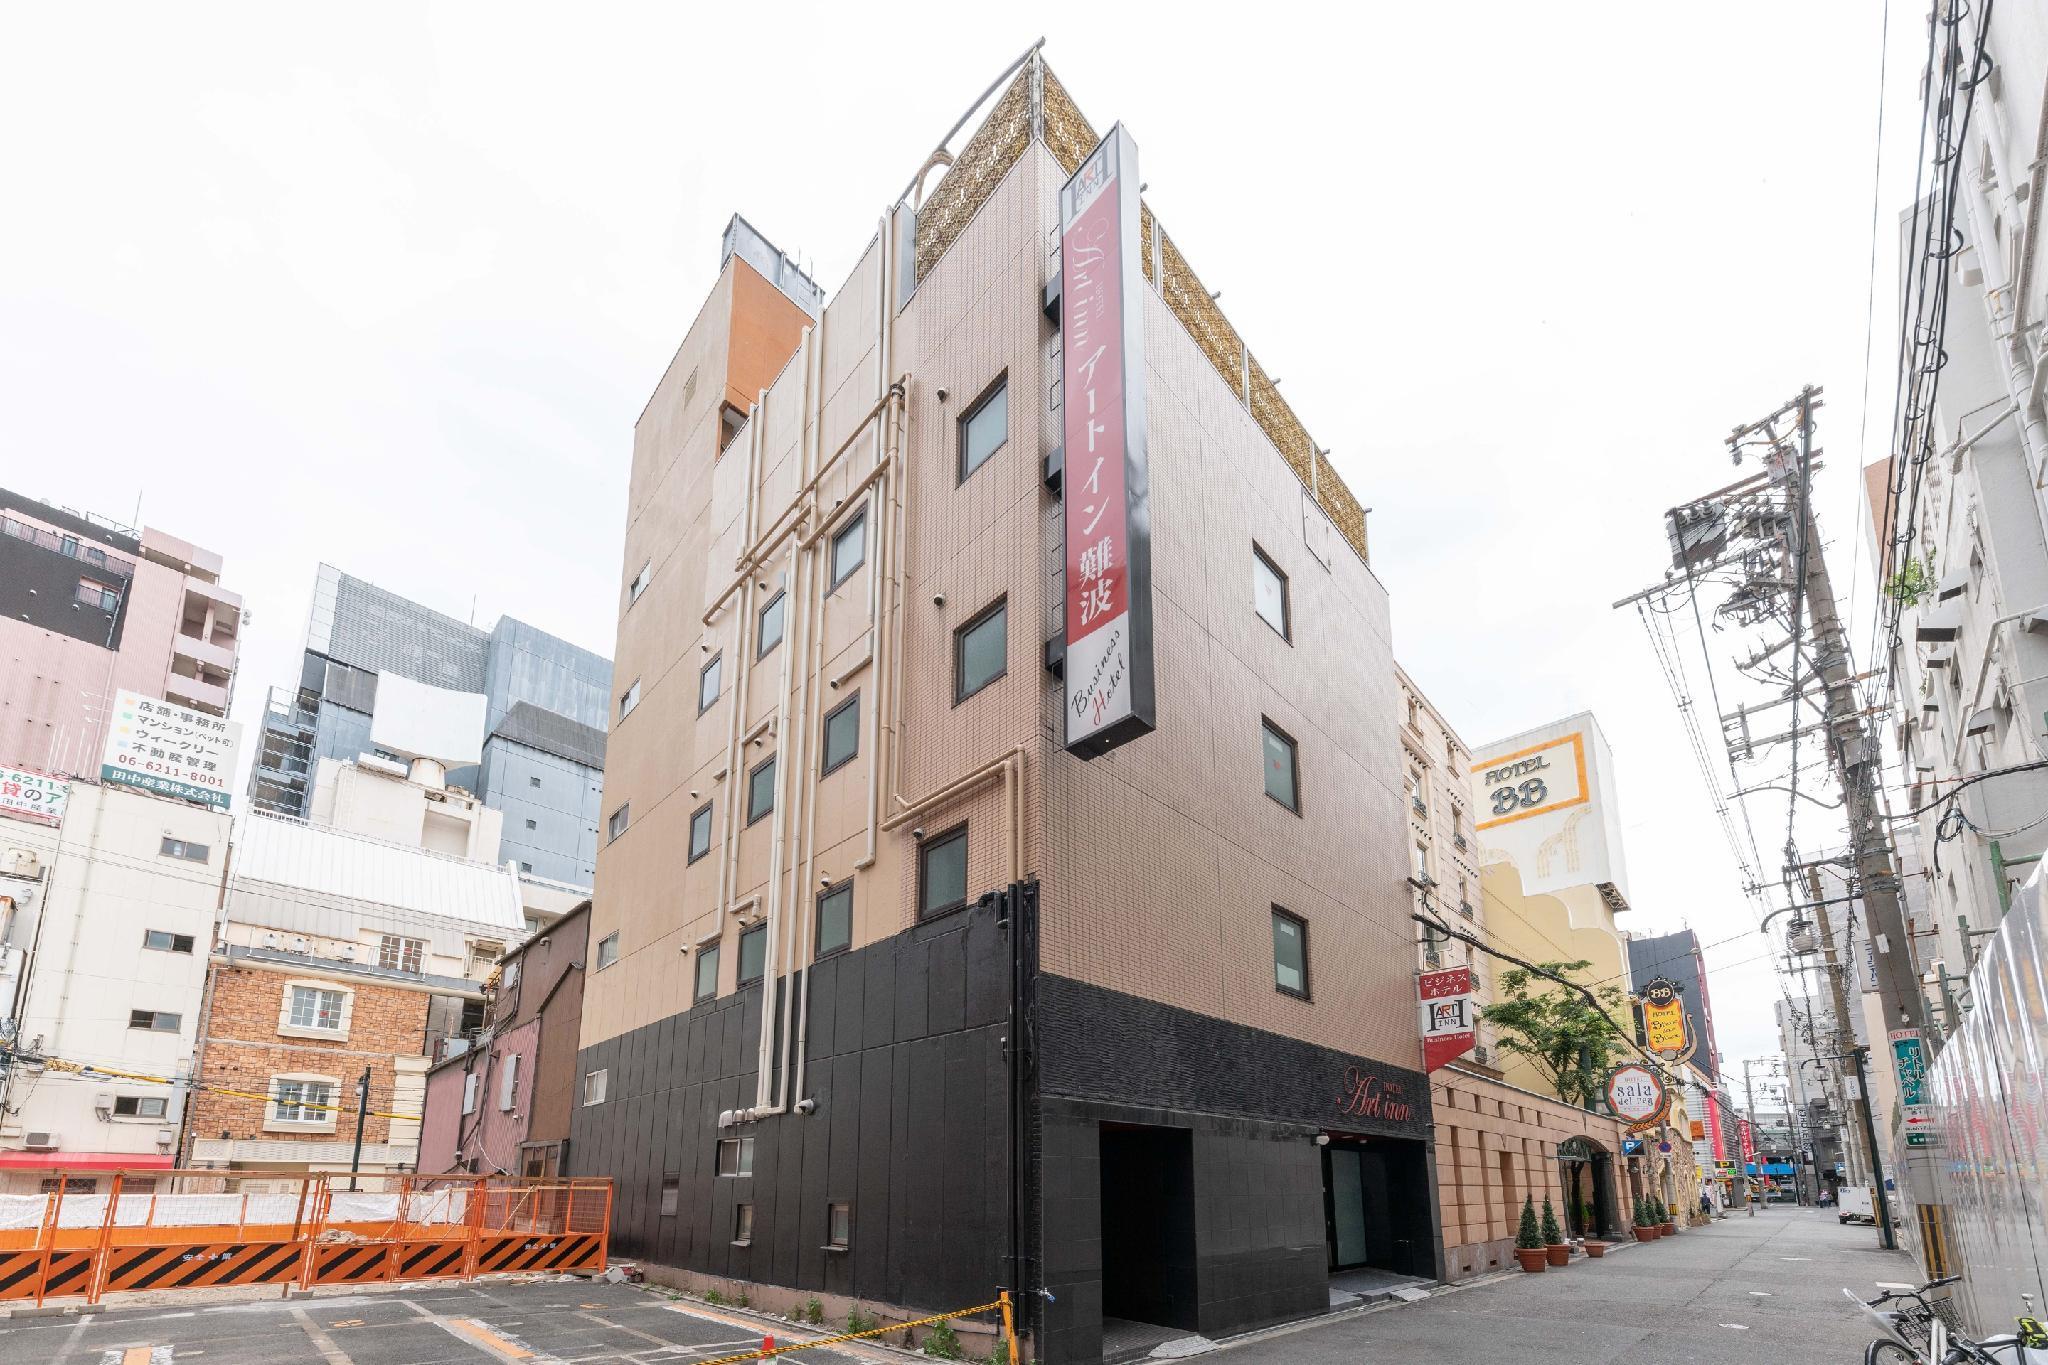 Oyo 644 Hotel Art Inn Namba Osaka Jepang Mulai Dari Rp